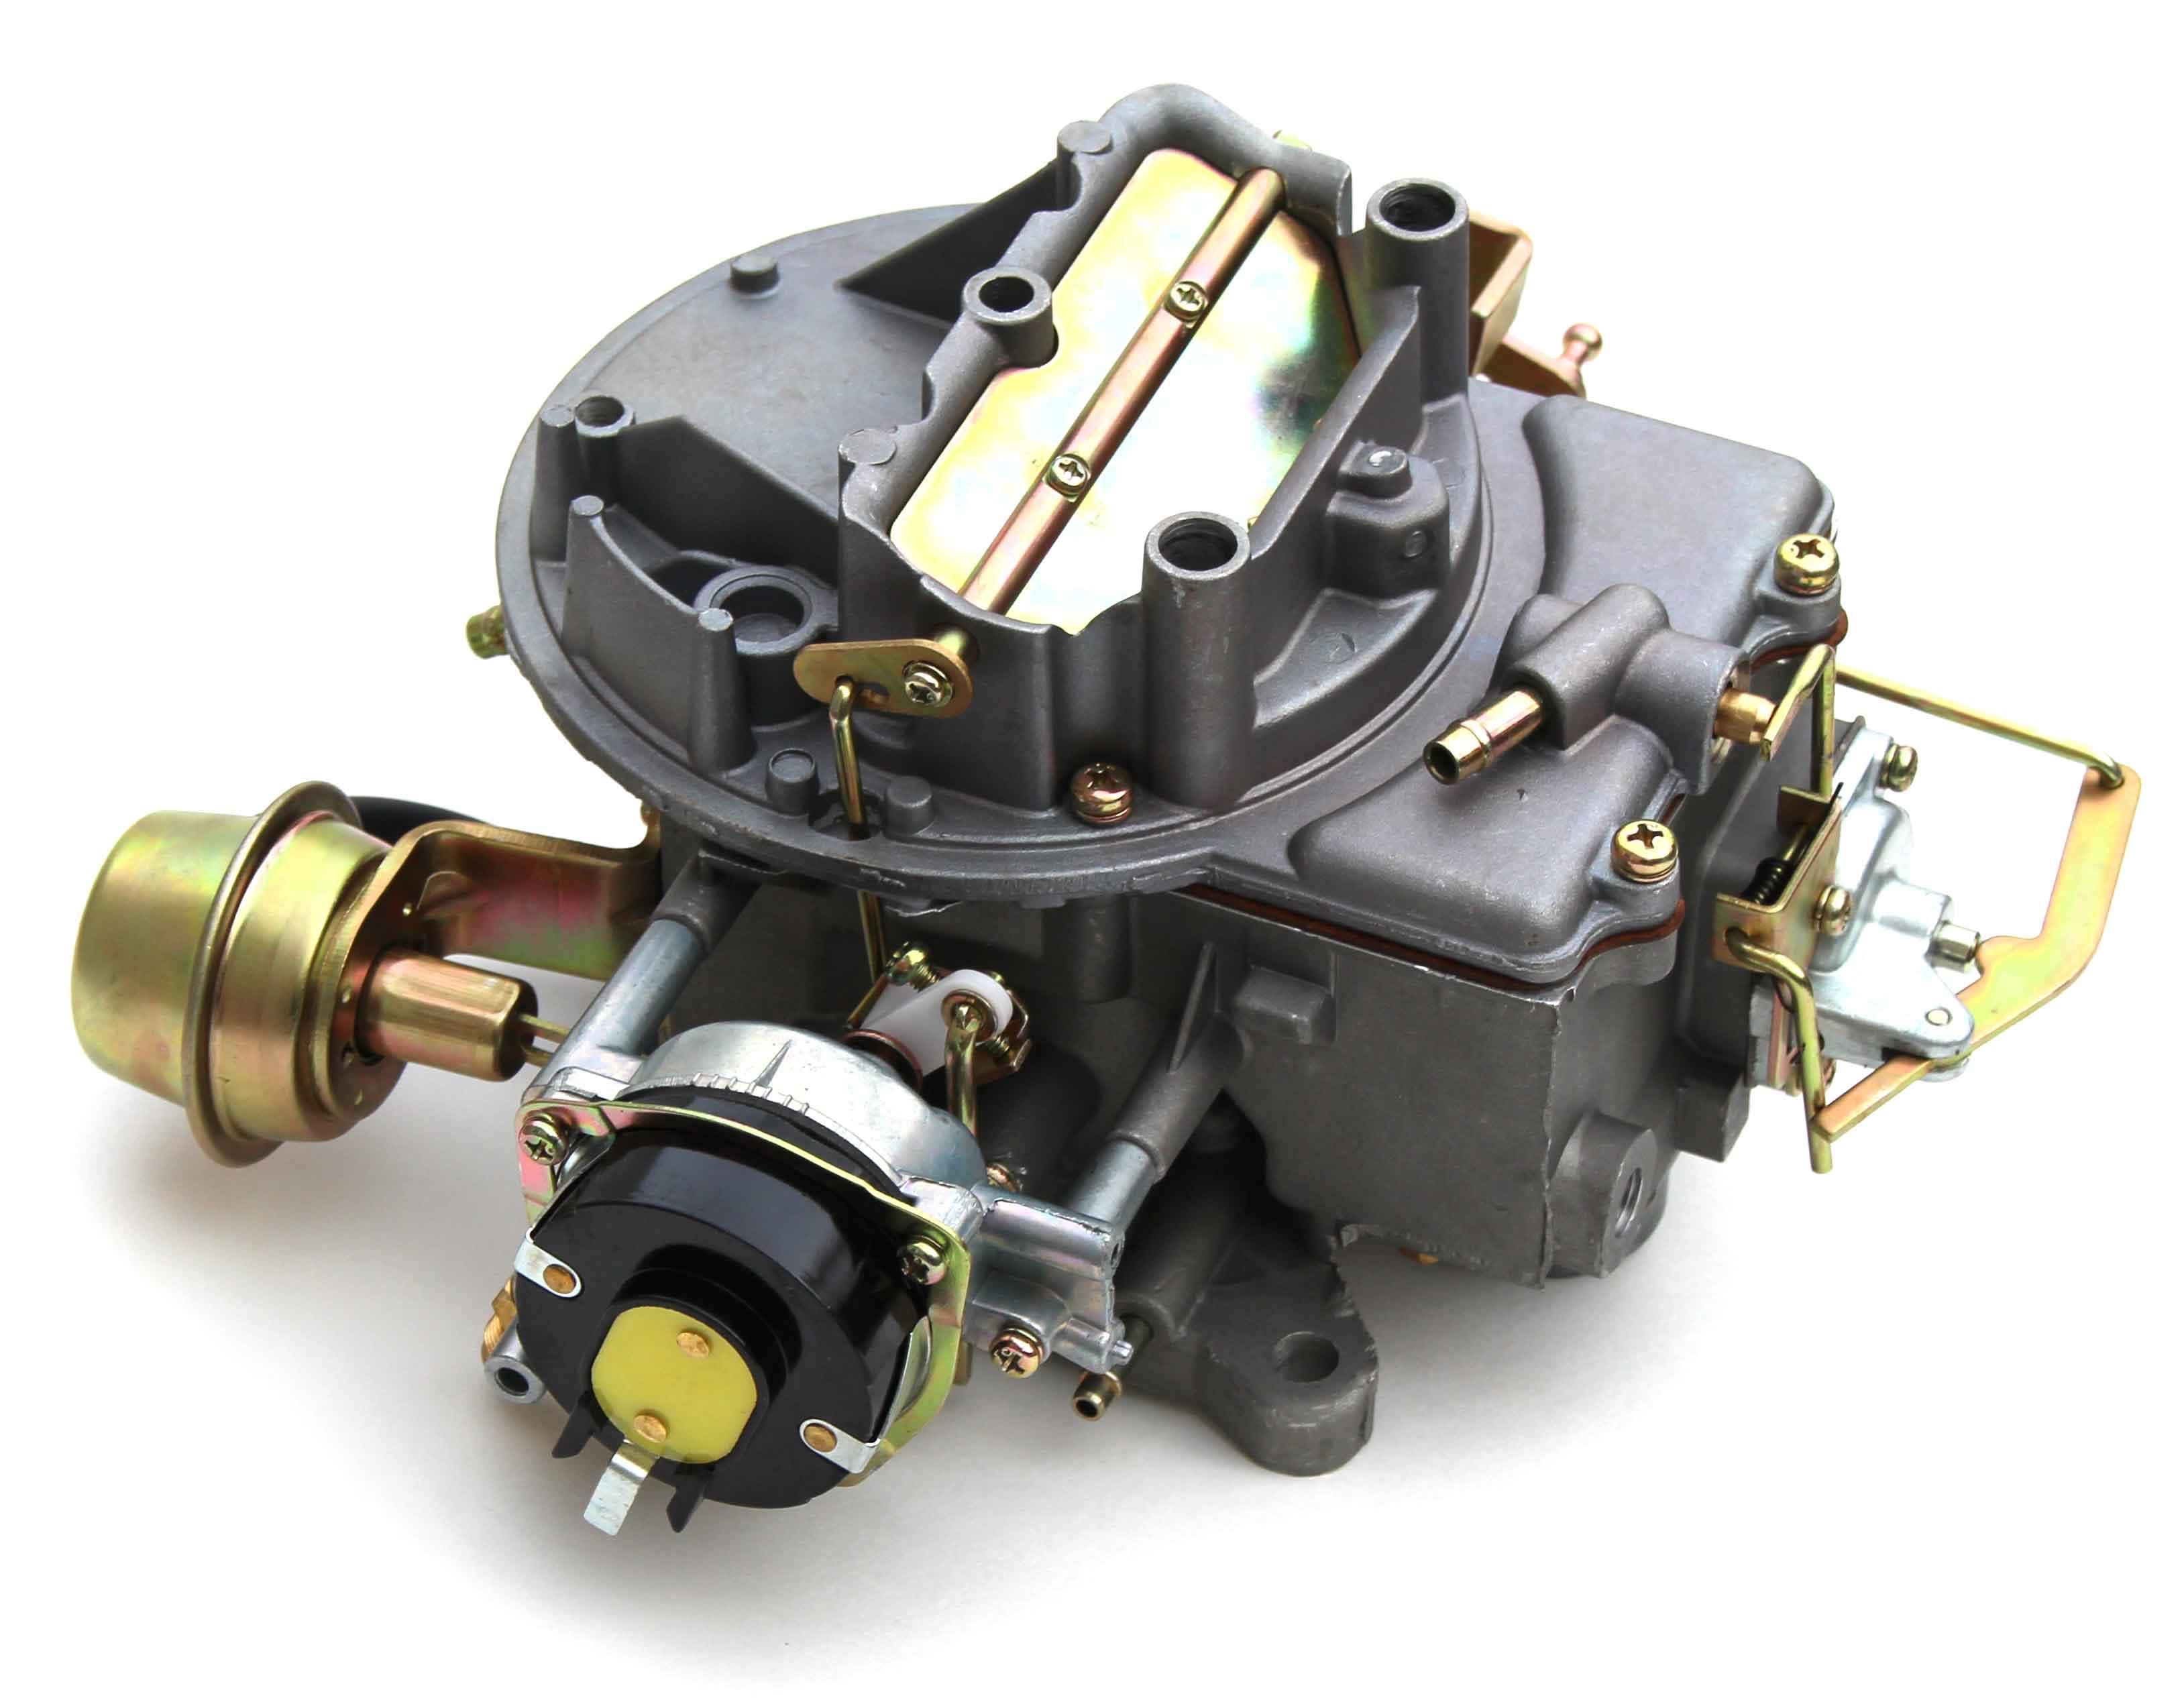 2100 carburetor ford barrel 302 carb 289 engine jeep cu parts wishlist